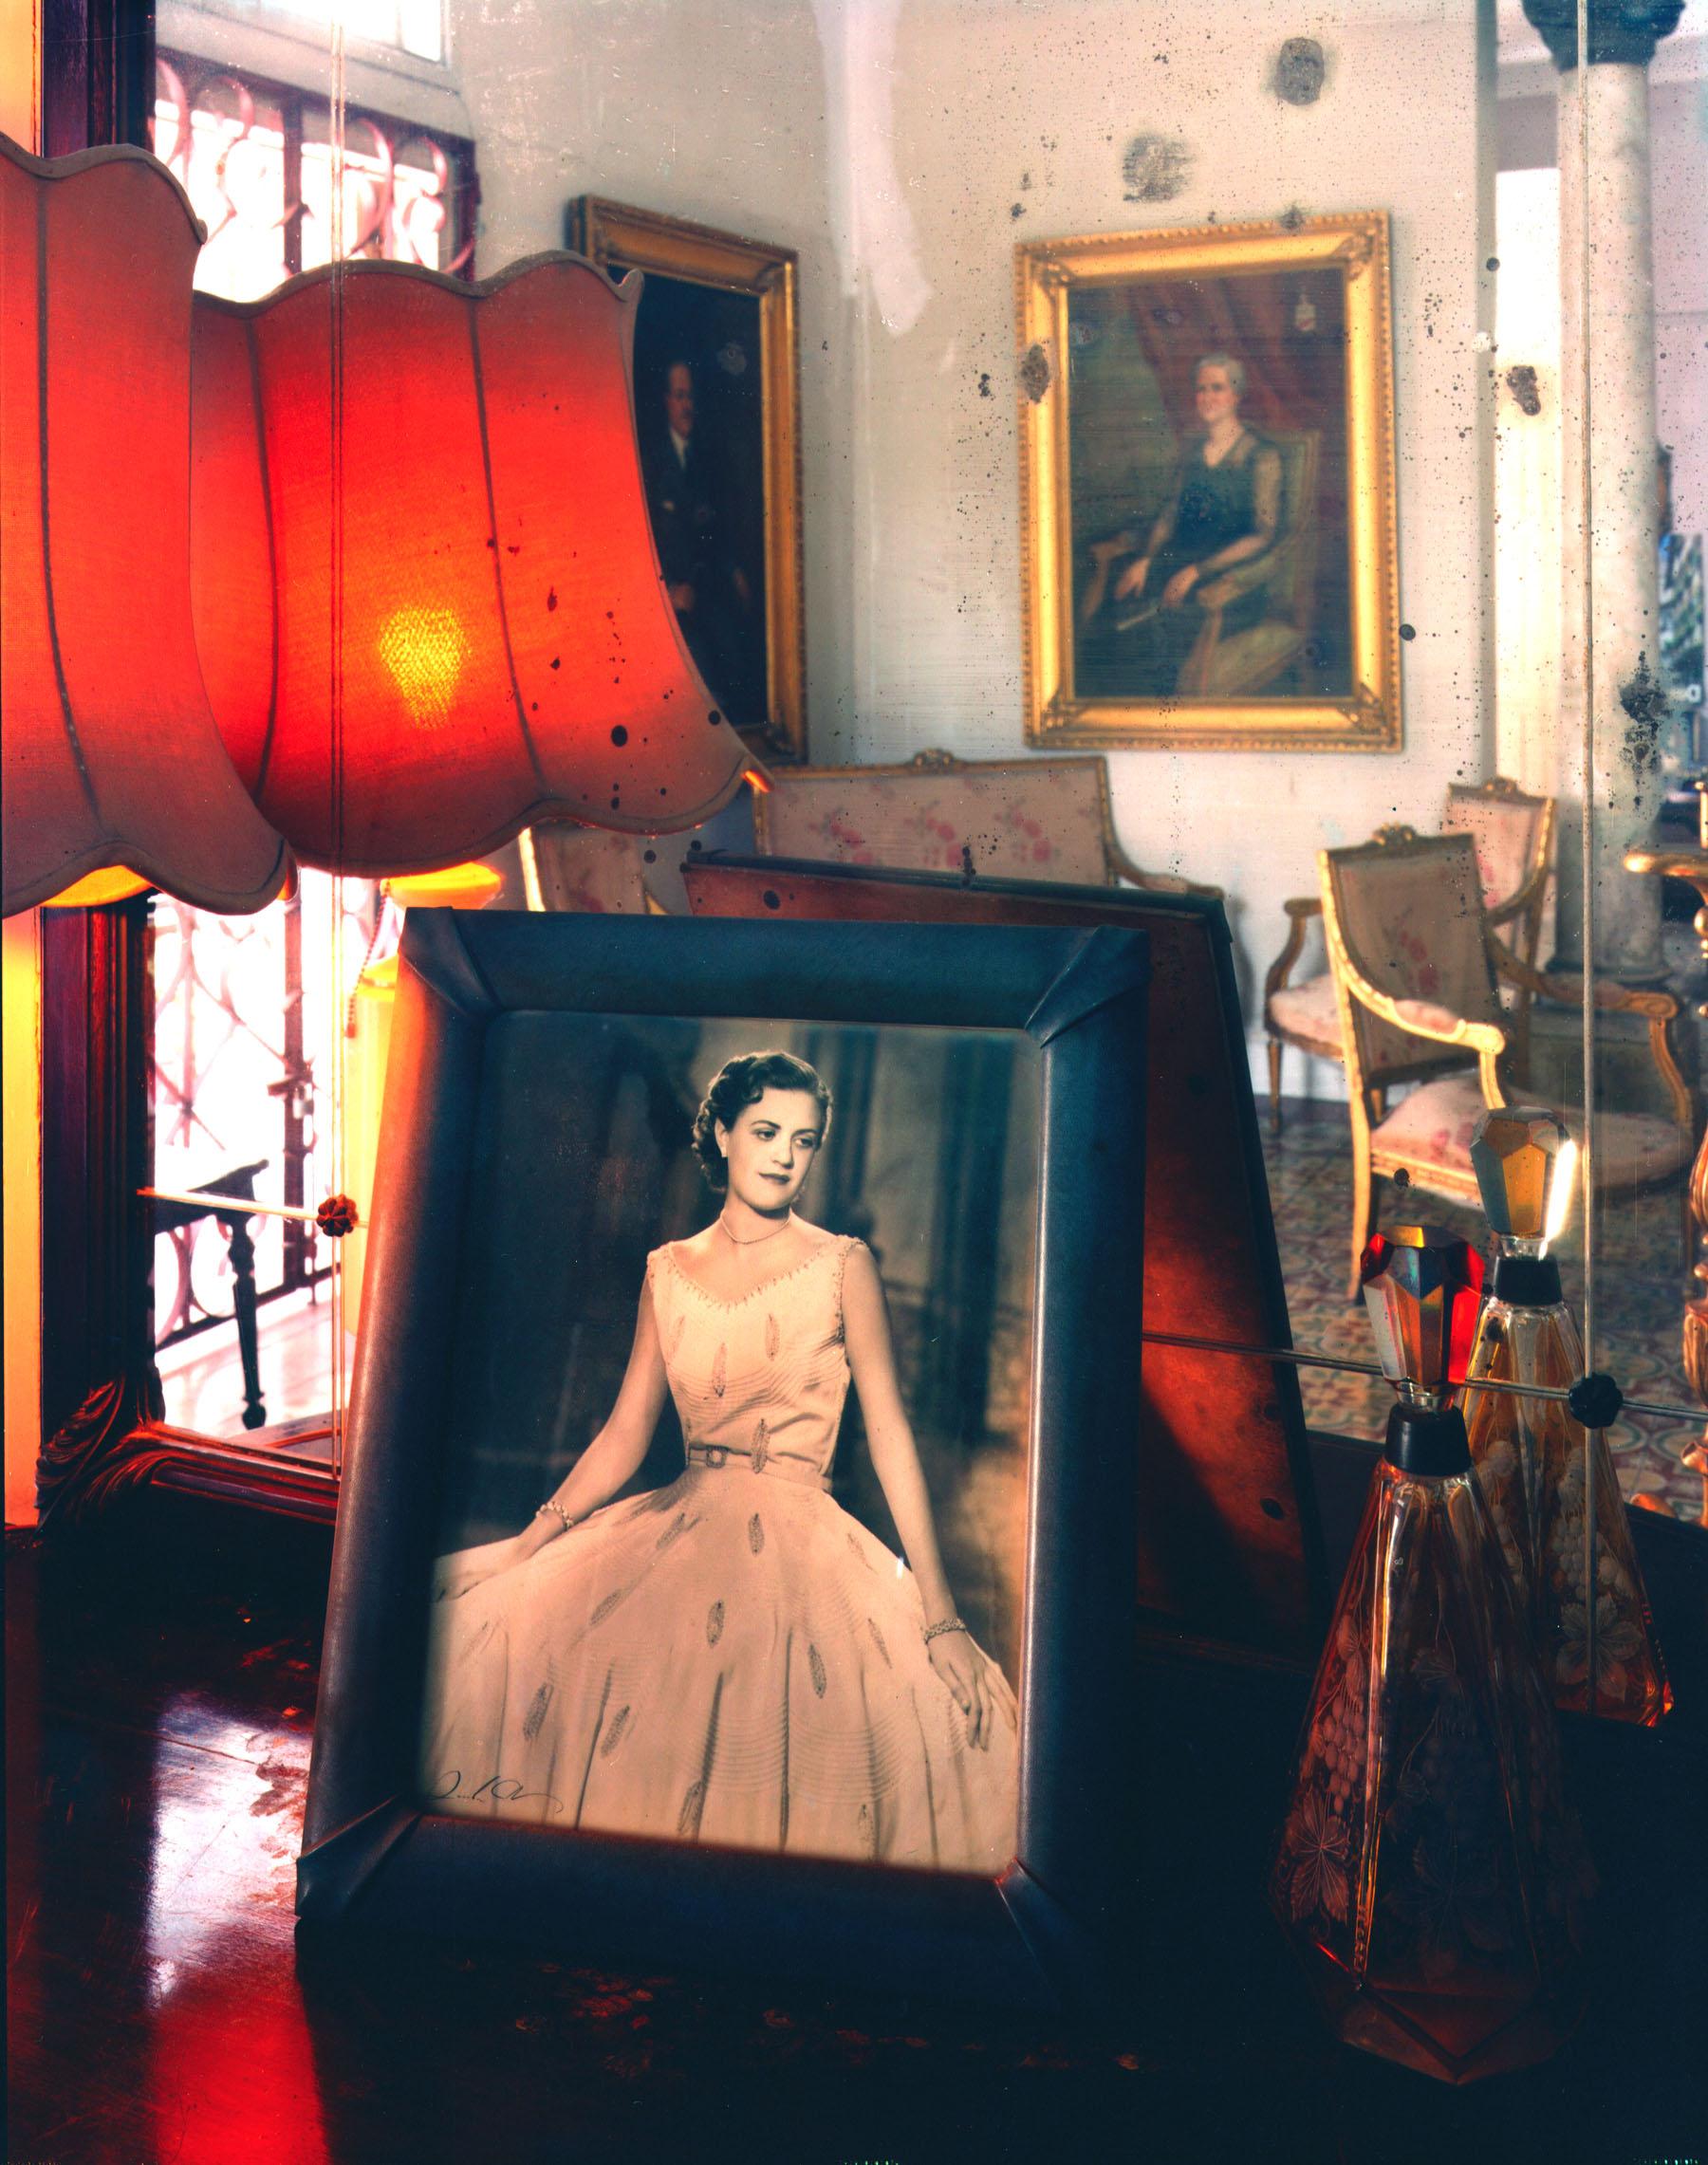 - Margarita, Havana, CubaAndrew MooreLoaned to the North Carolina Museum of ArtRaleigh, North Carolina, 2015-2016Loaned to the Mint Museum of ArtCharlotte, North Carolina, 2007